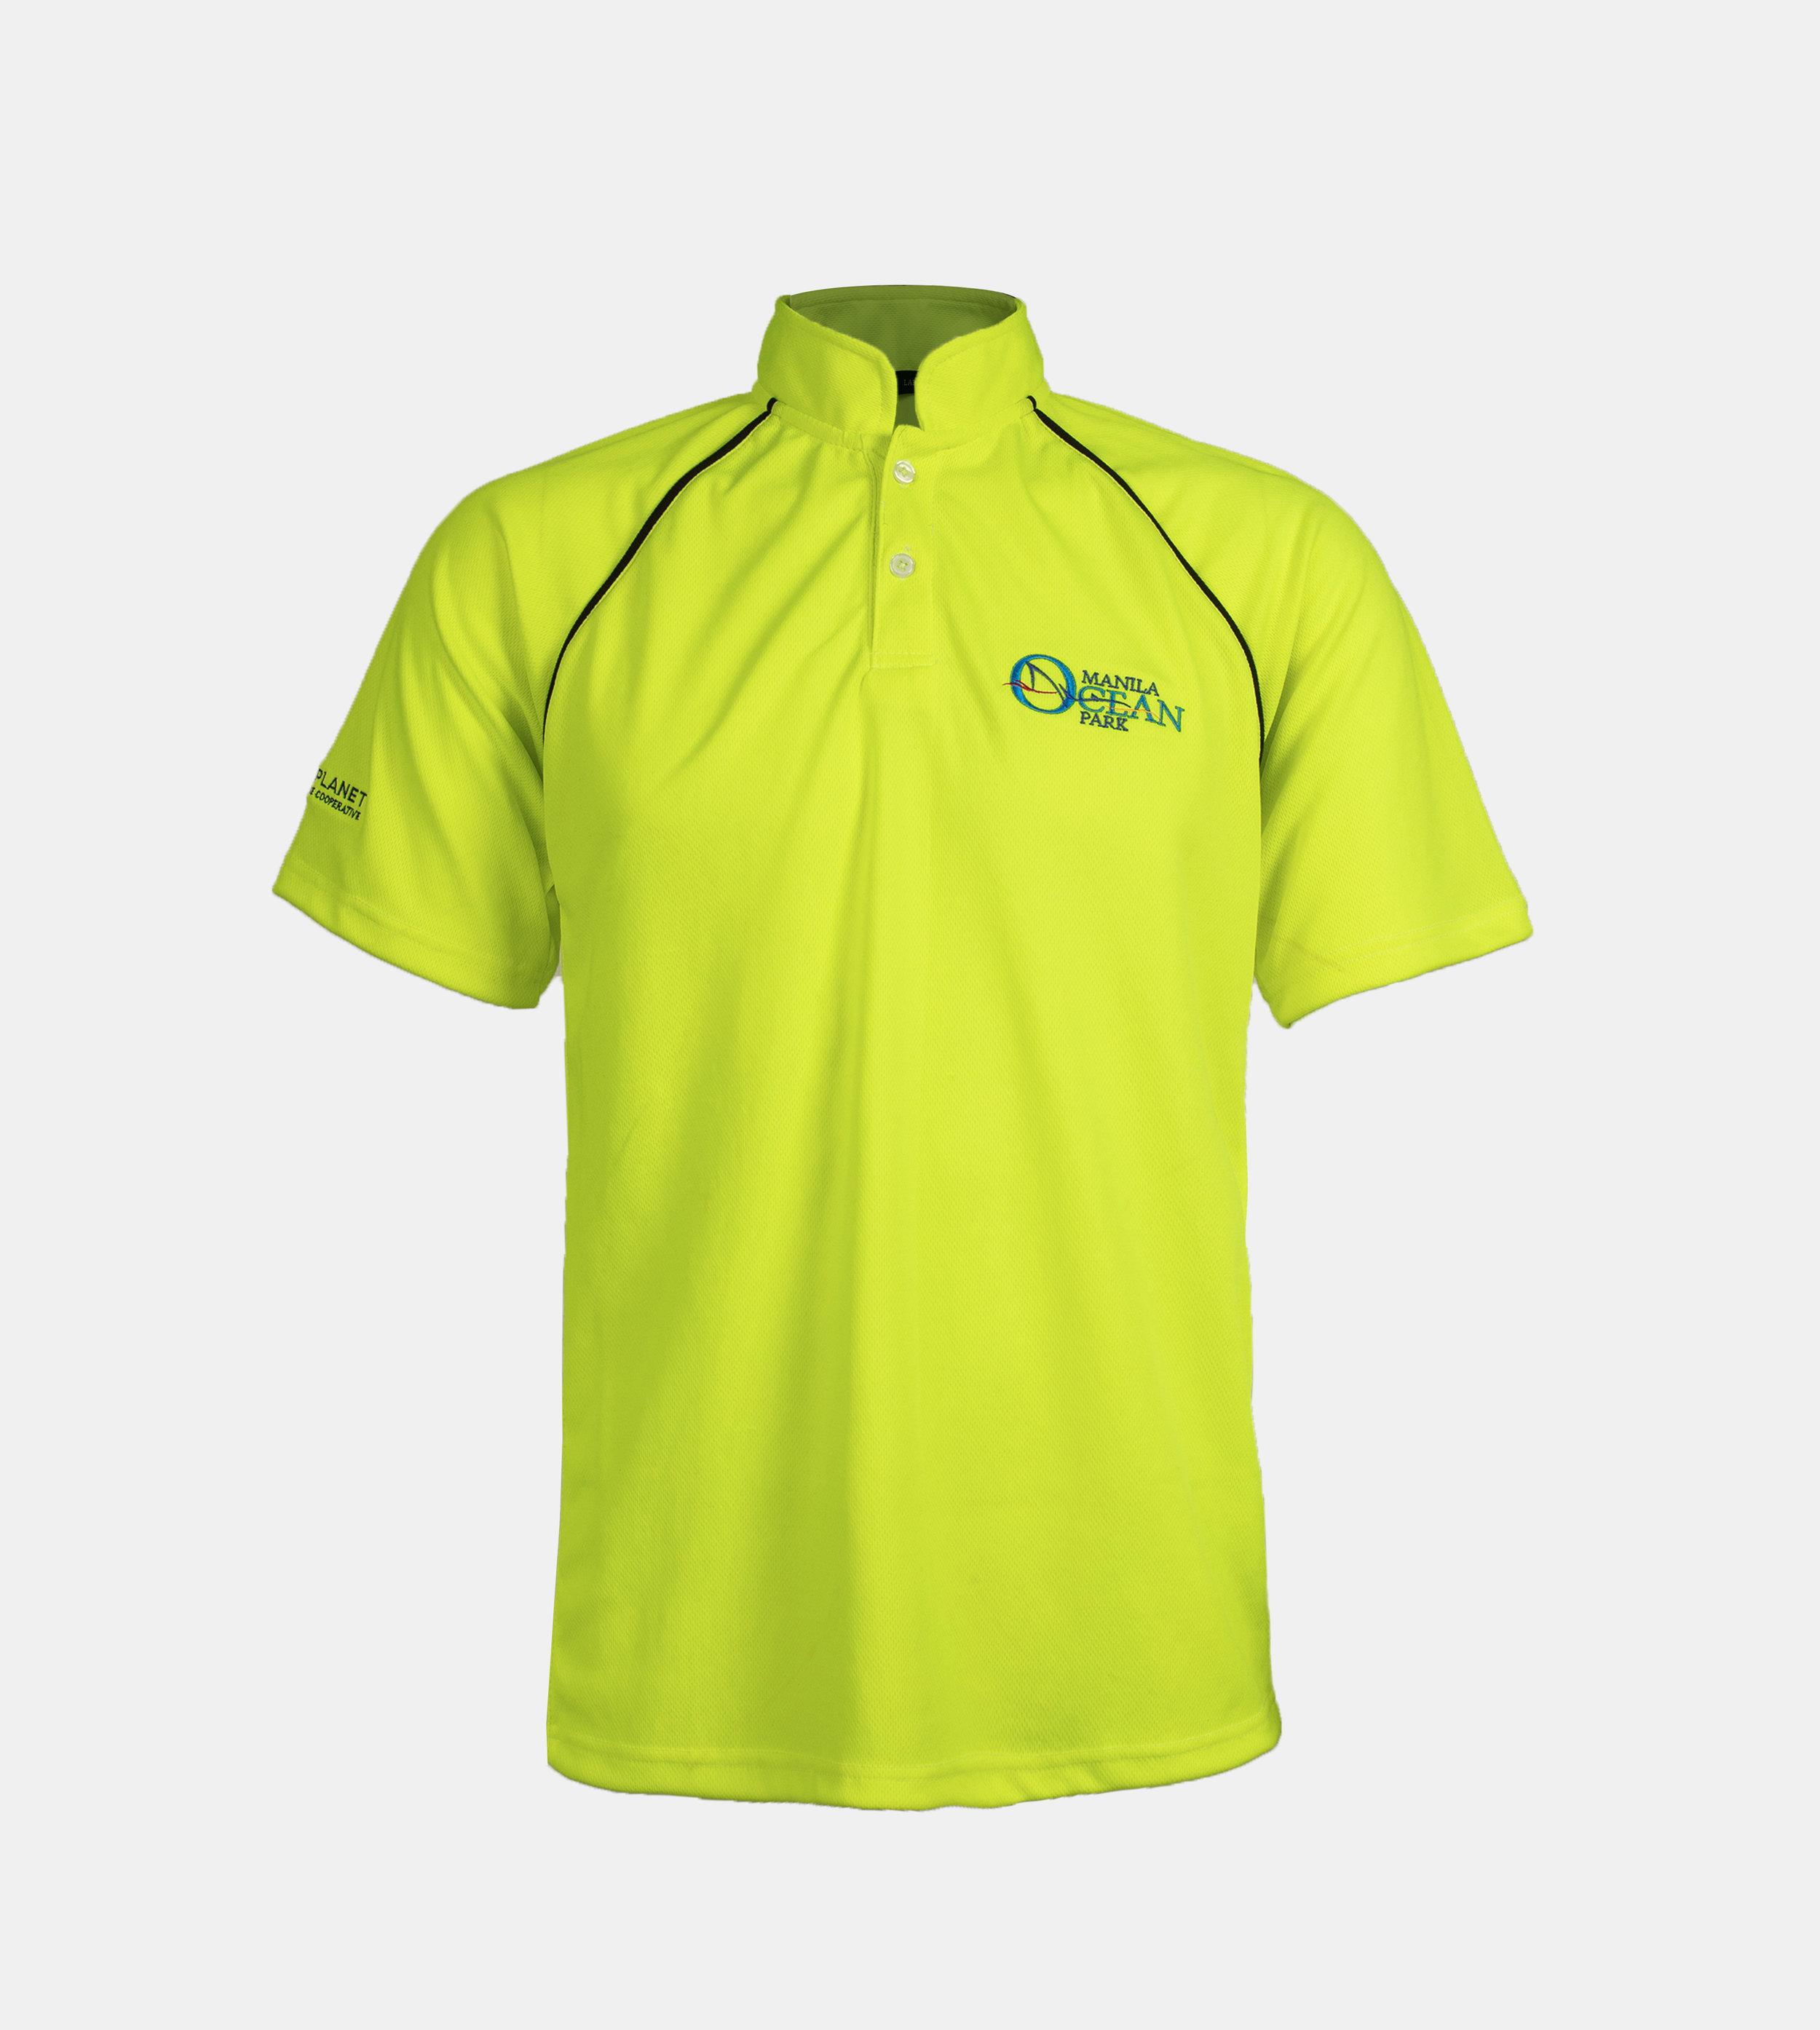 Tailored Projects-Custom Shirt-Drifit-ManilaOceanPark.jpg